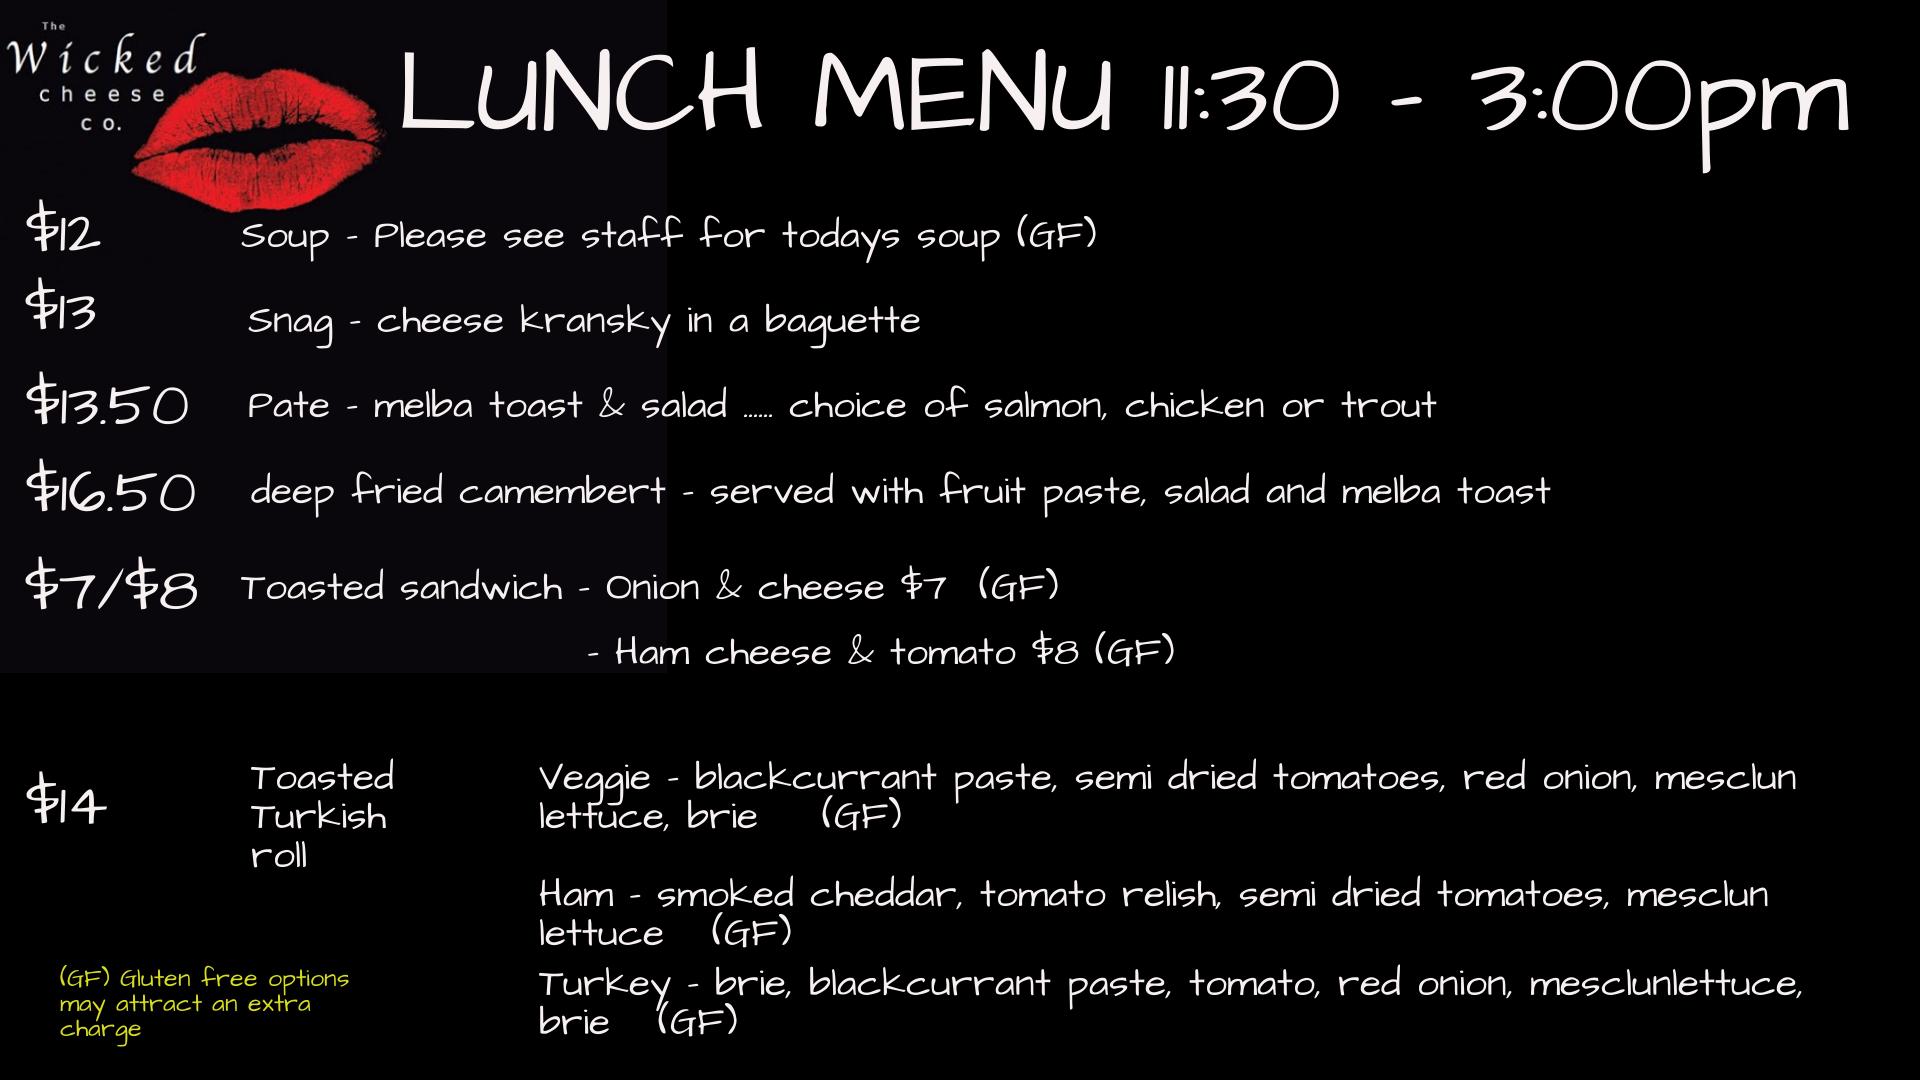 1619737476818-fusiontemplate-screenshot-lunch-menu.png